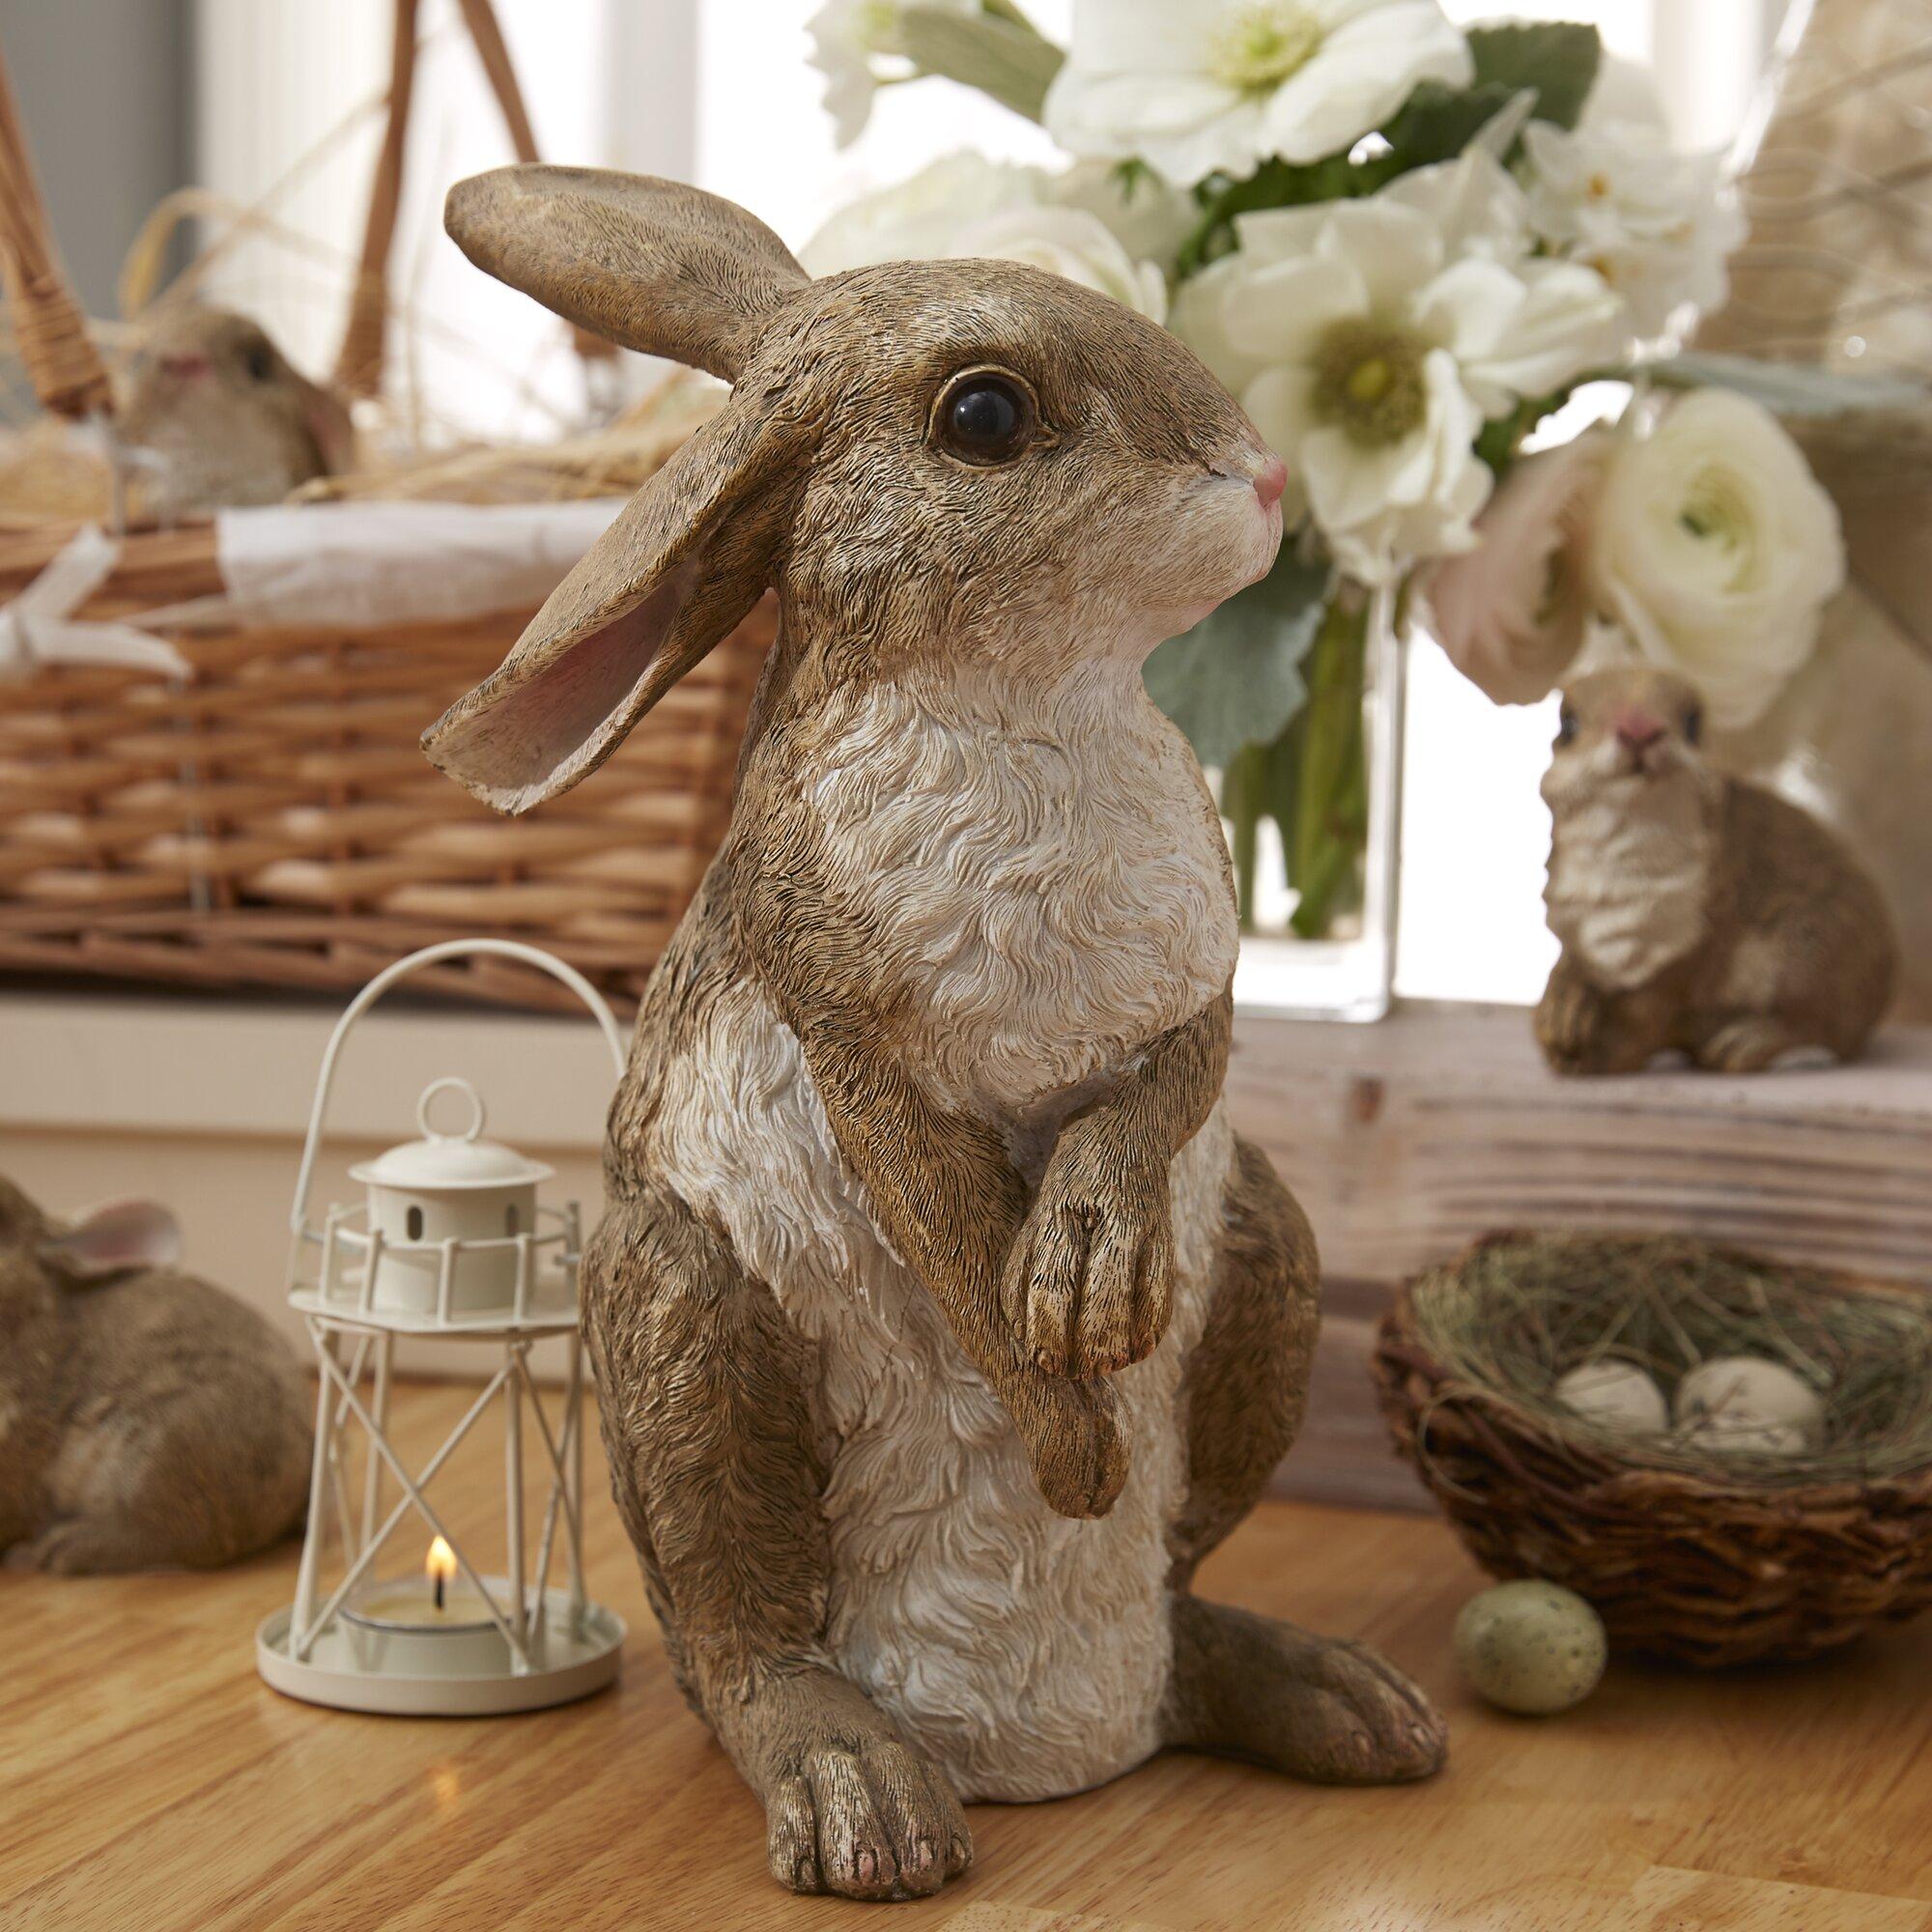 Uncategorized Bunny Kitchen Appliances design toscano hopper the bunny standing garden rabbit statue statue